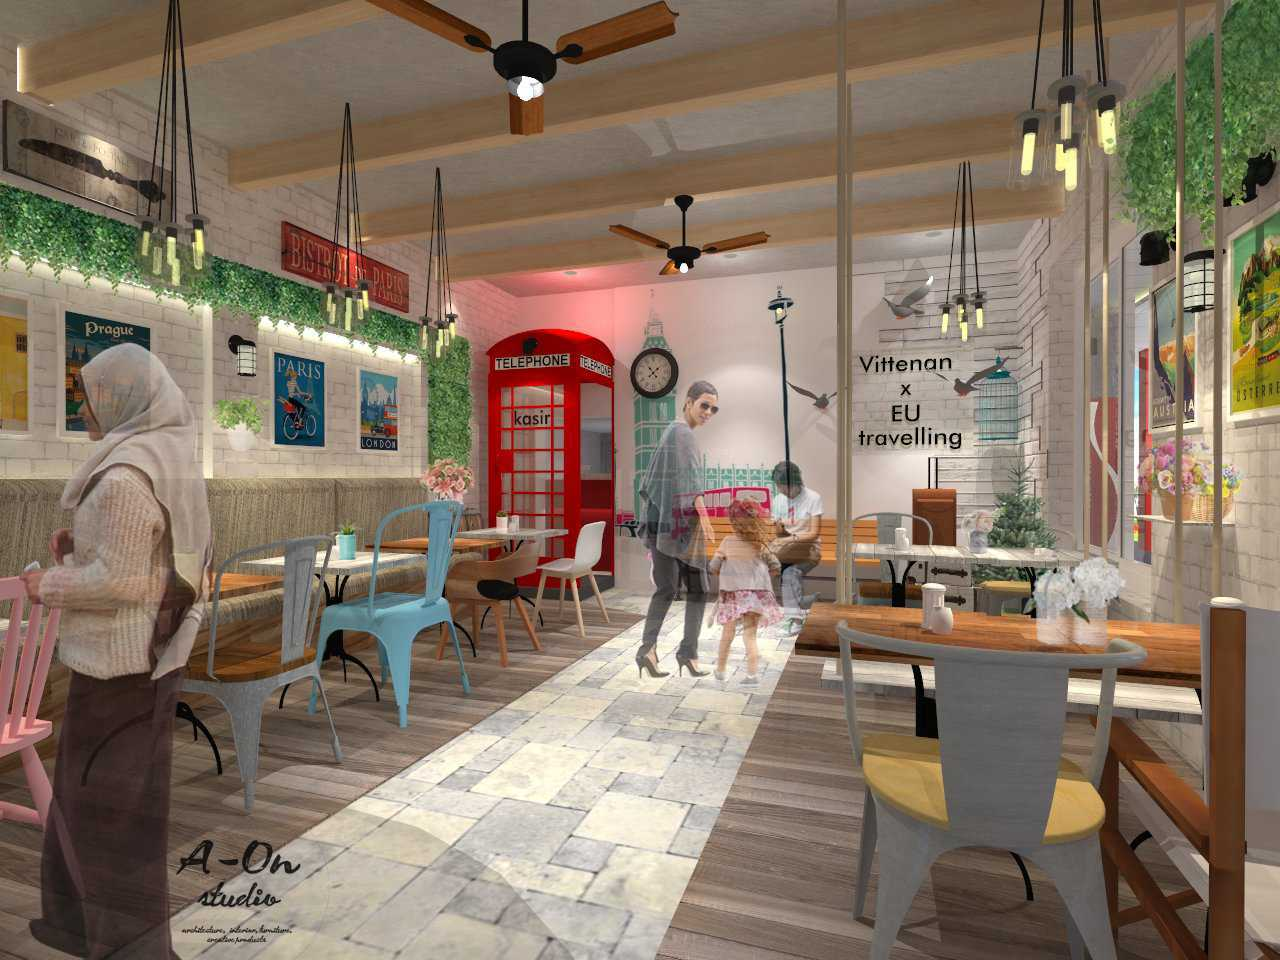 A-On Studio Vittenan Cafe And Resto Kebumen Regency, Central Java, Indonesia Kebumen Regency, Central Java, Indonesia Lt1-B Industrial,kontemporer Labtai 1, Area Makan Indoor. 32823